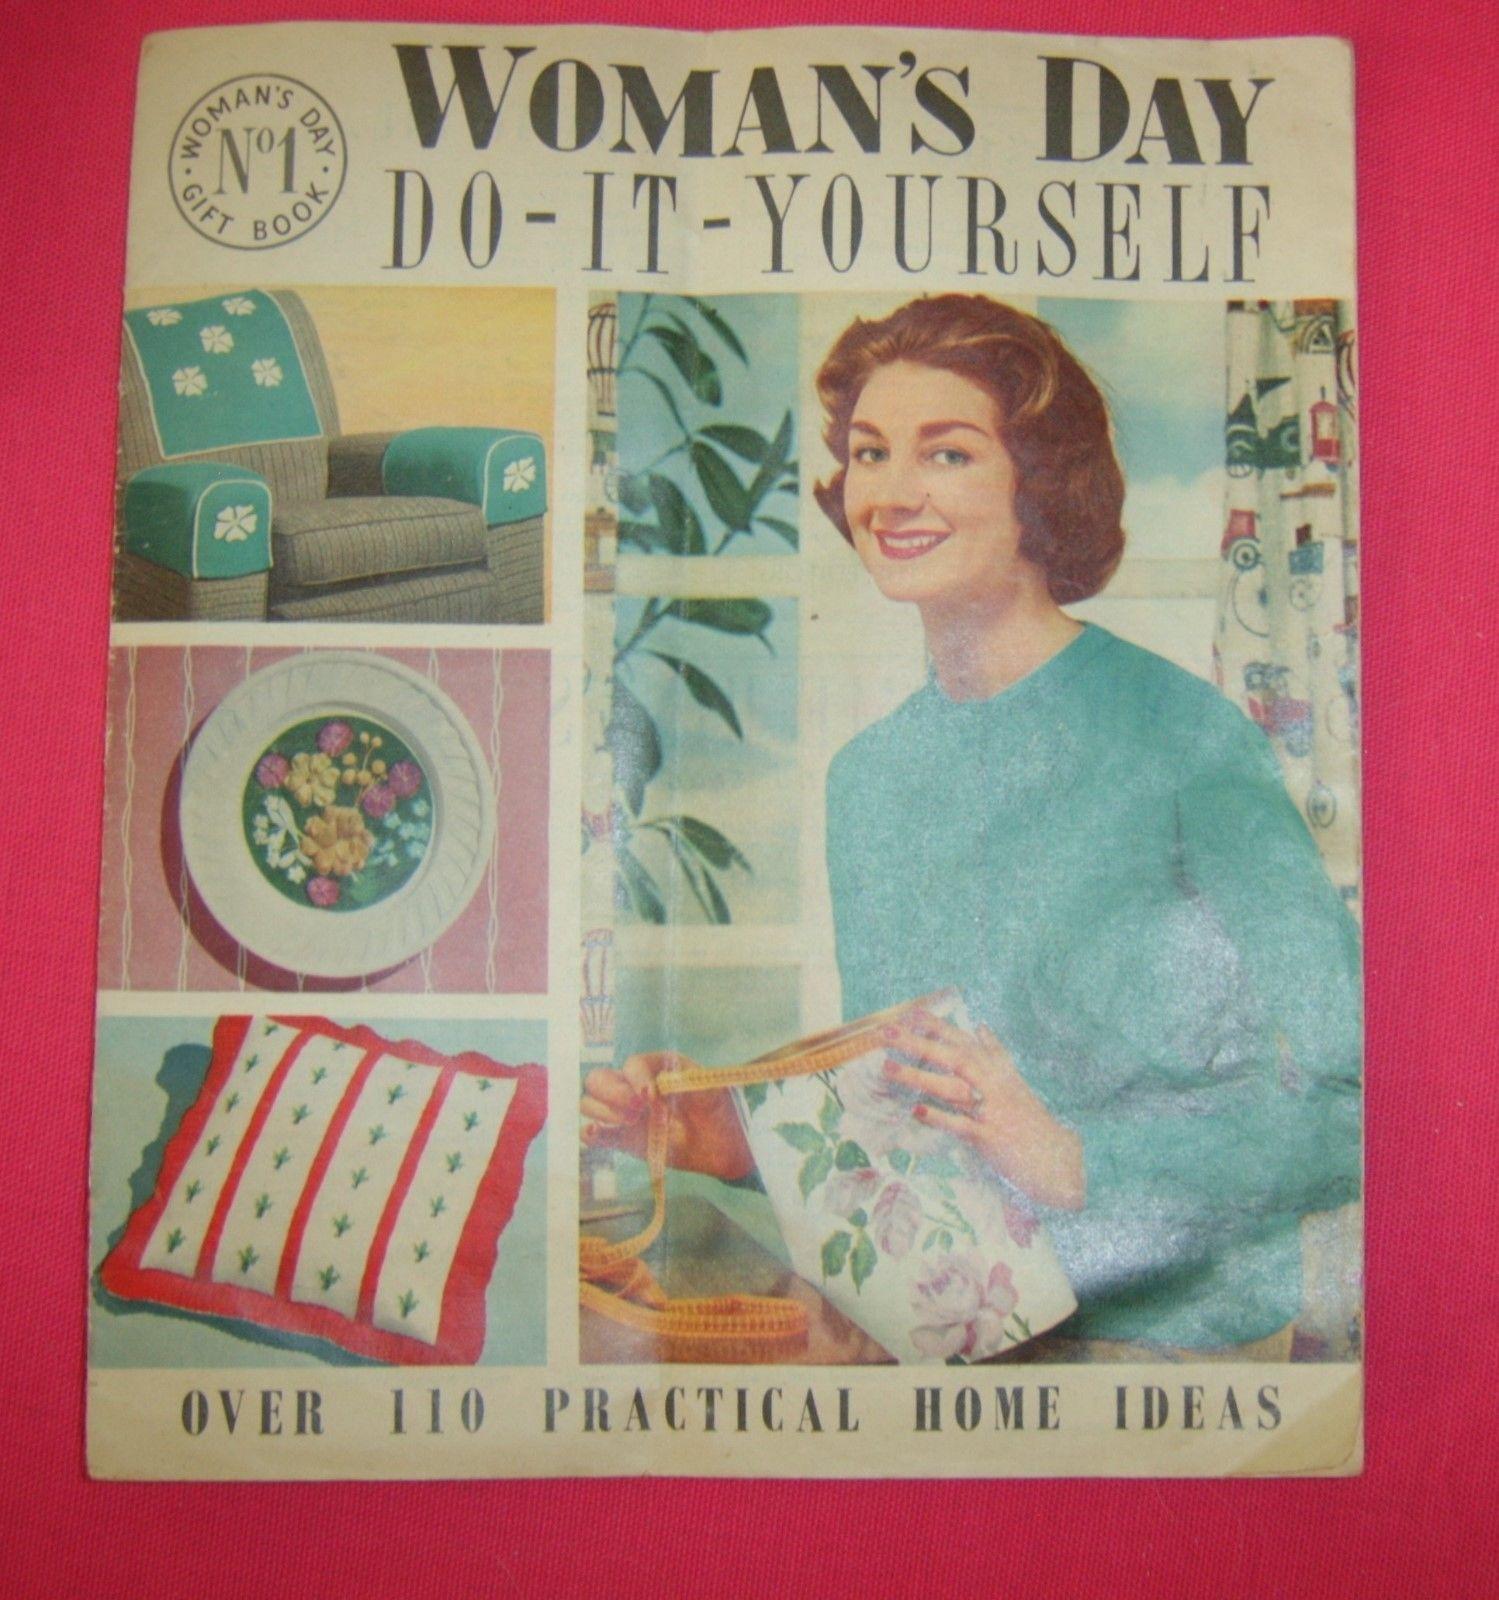 Original 1958 womans day do it yourself gift book ebay vintage original 1958 womans day do it yourself gift book ebay solutioingenieria Choice Image